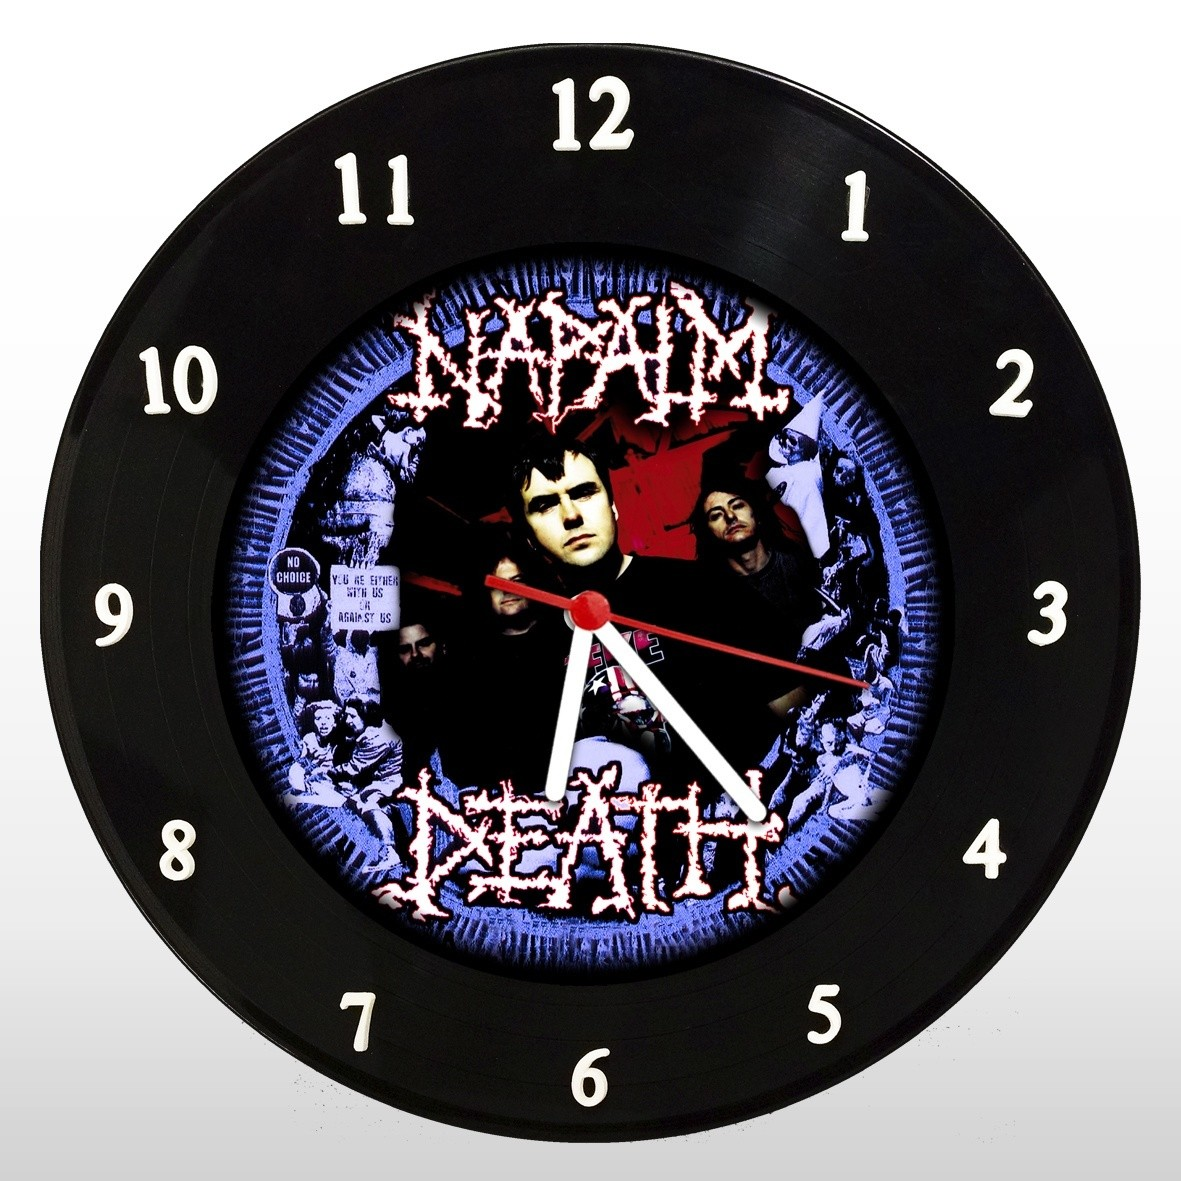 Napalm Death - Relógio de Parede em Disco de Vinil - Mr. Rock